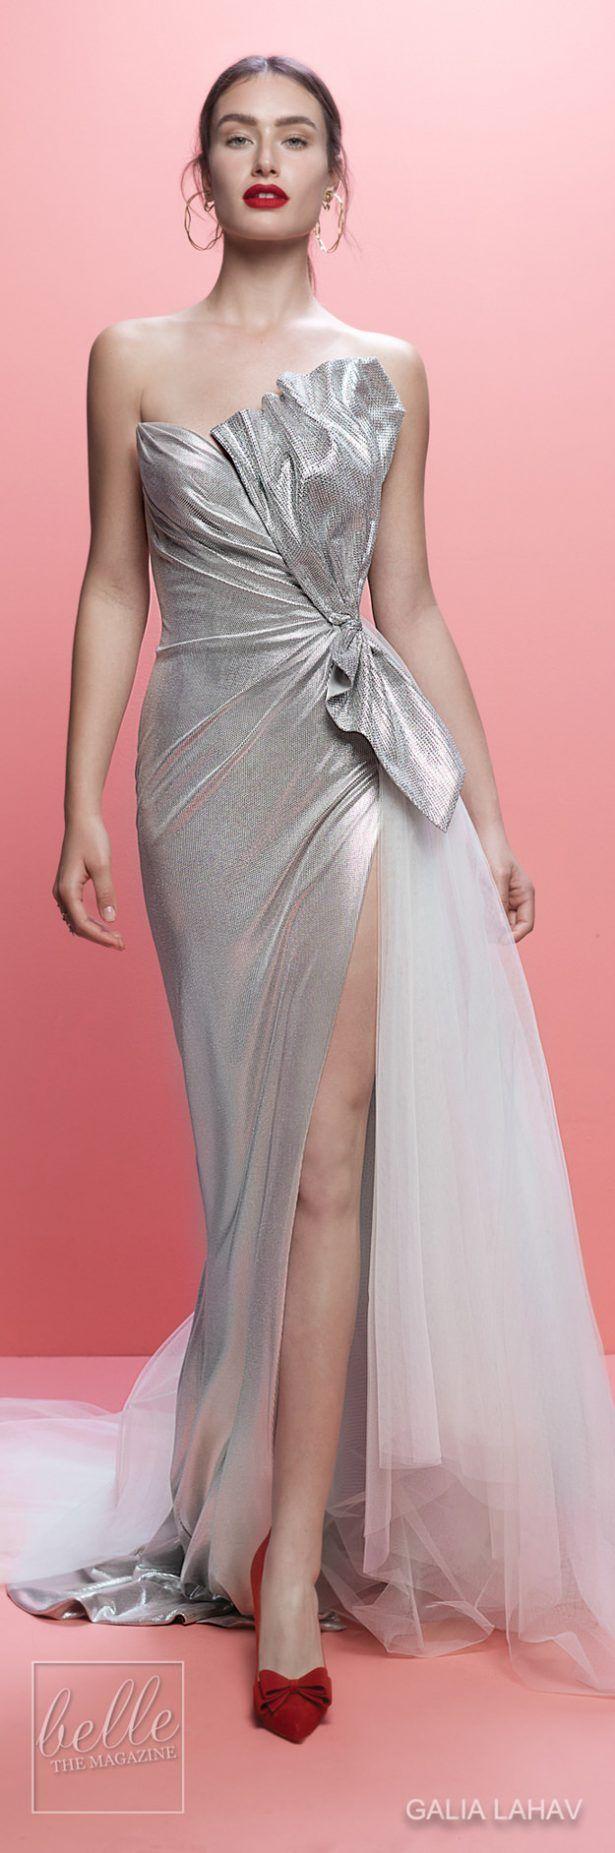 Fantástico Vestidos De Novia Burton On Trent Inspiración - Colección ...